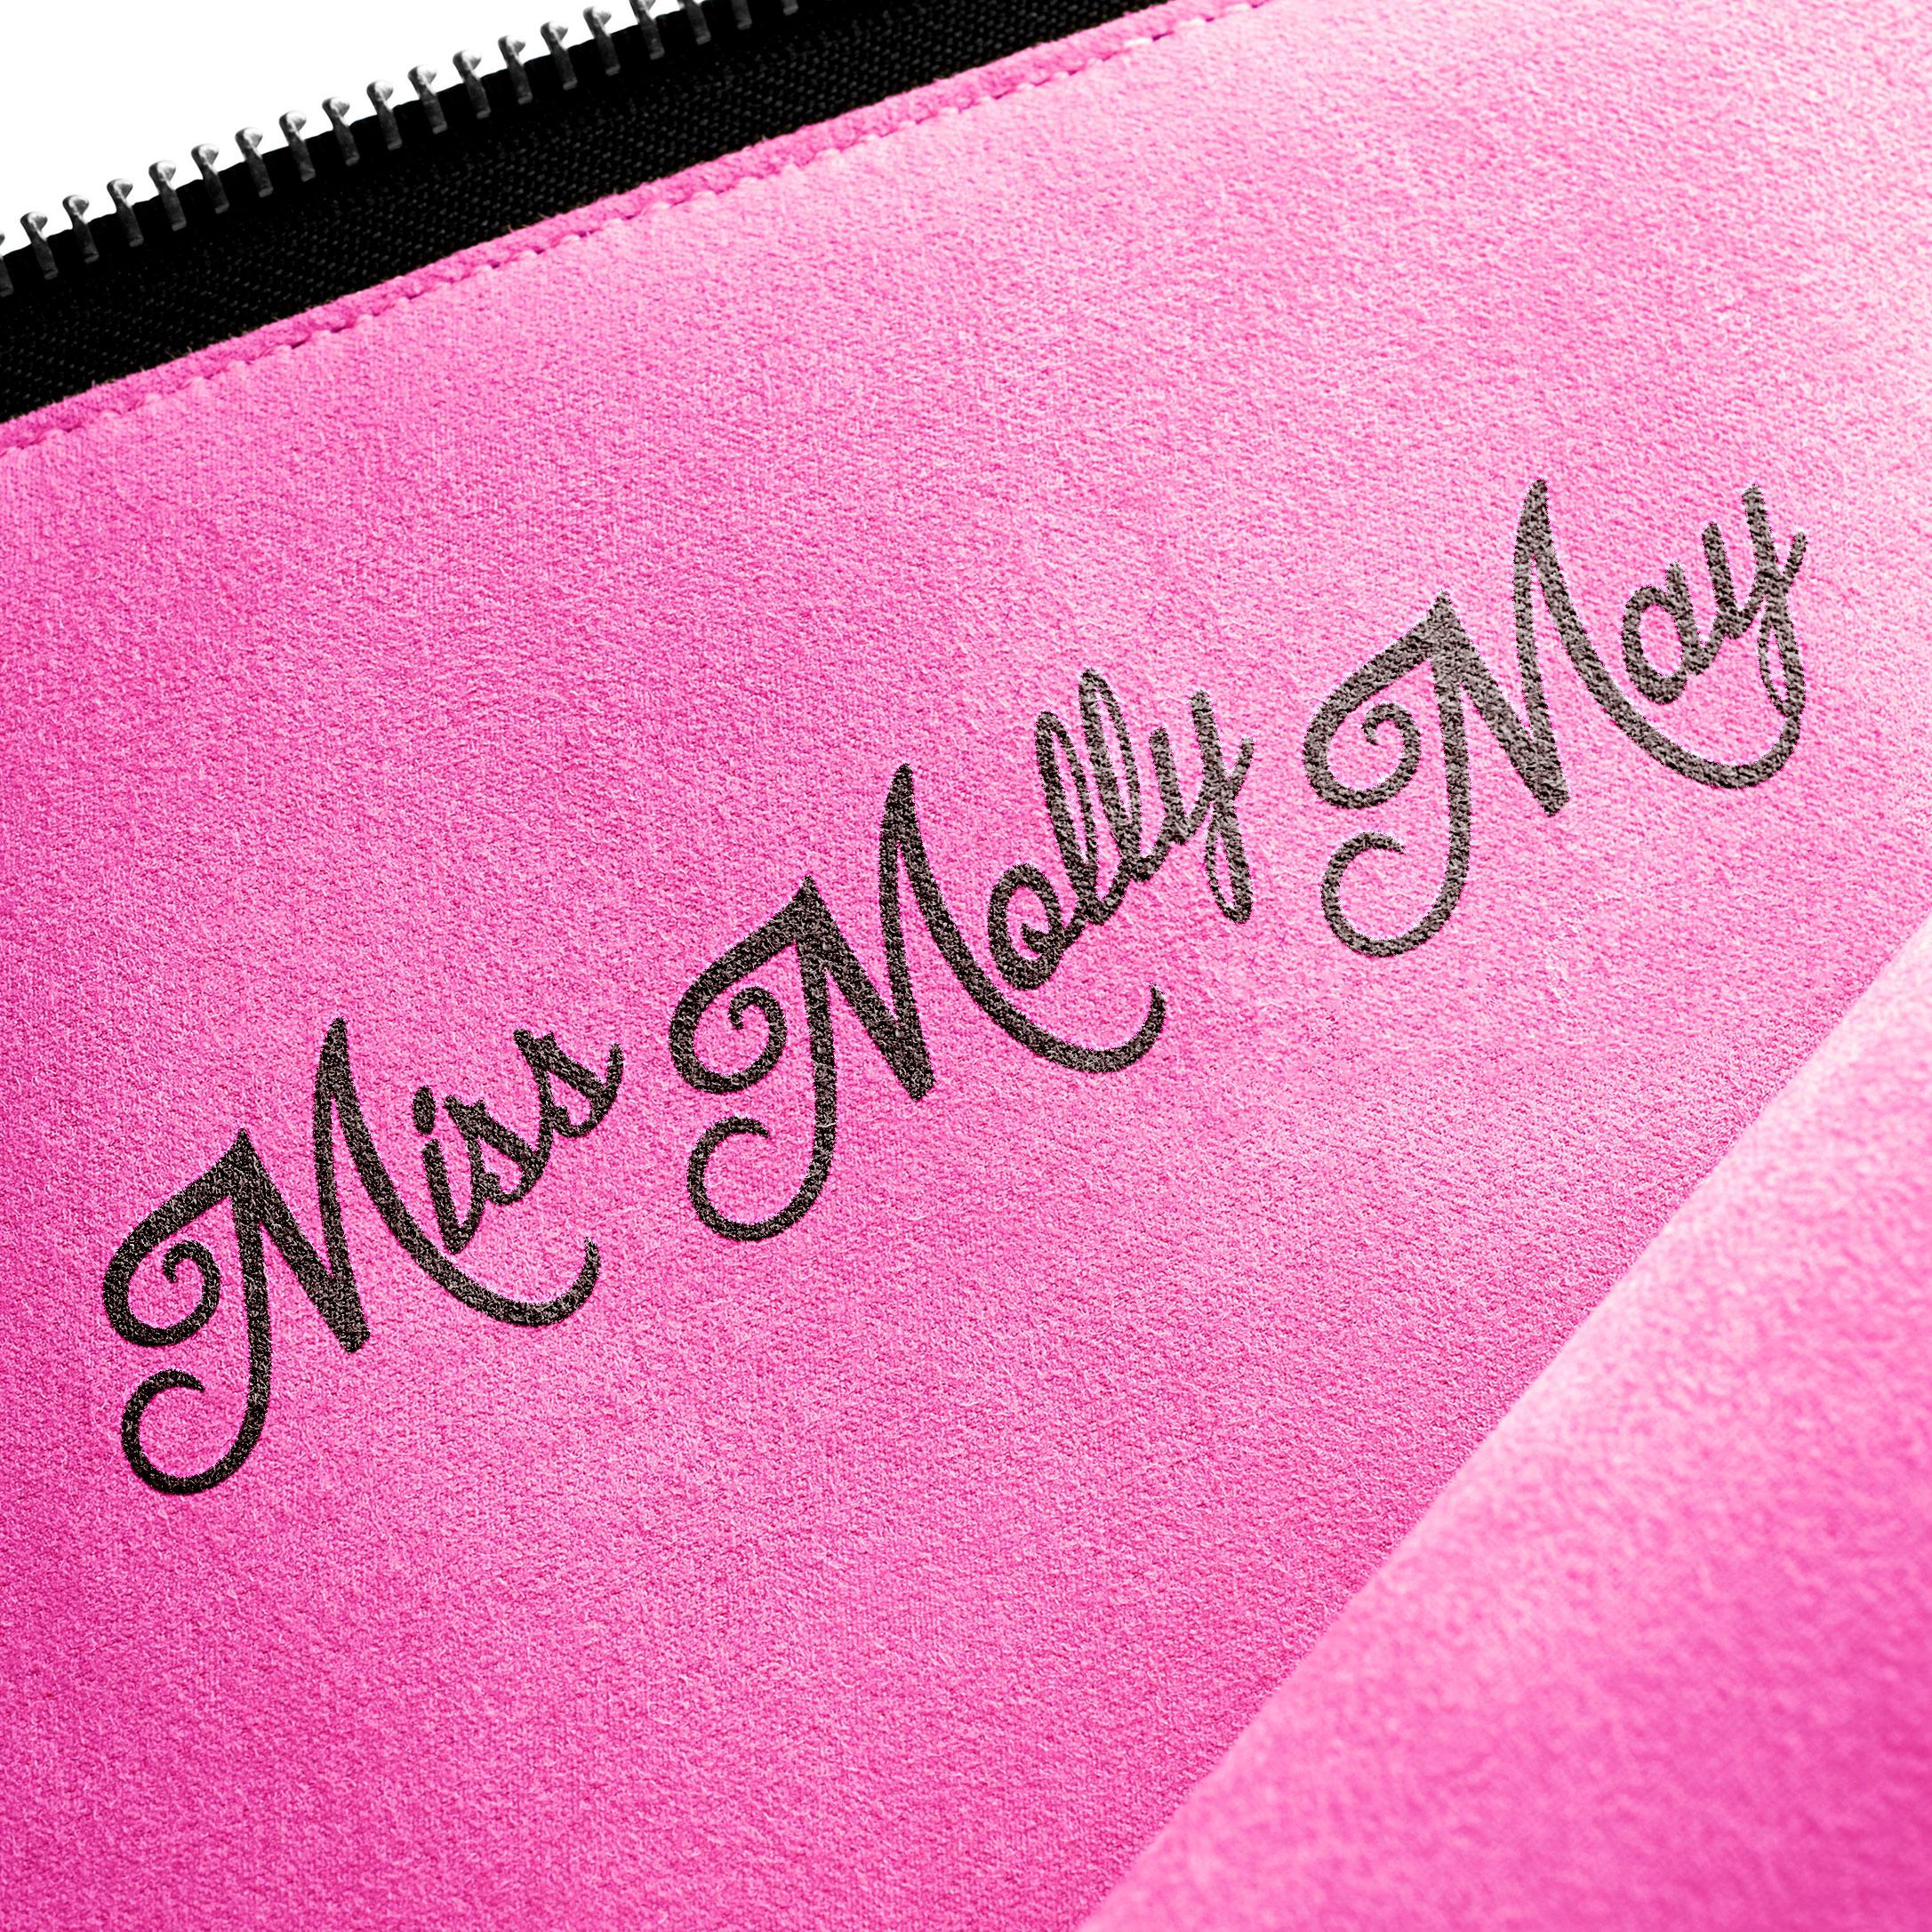 Miss Molly May Vintage Clothing - Logo